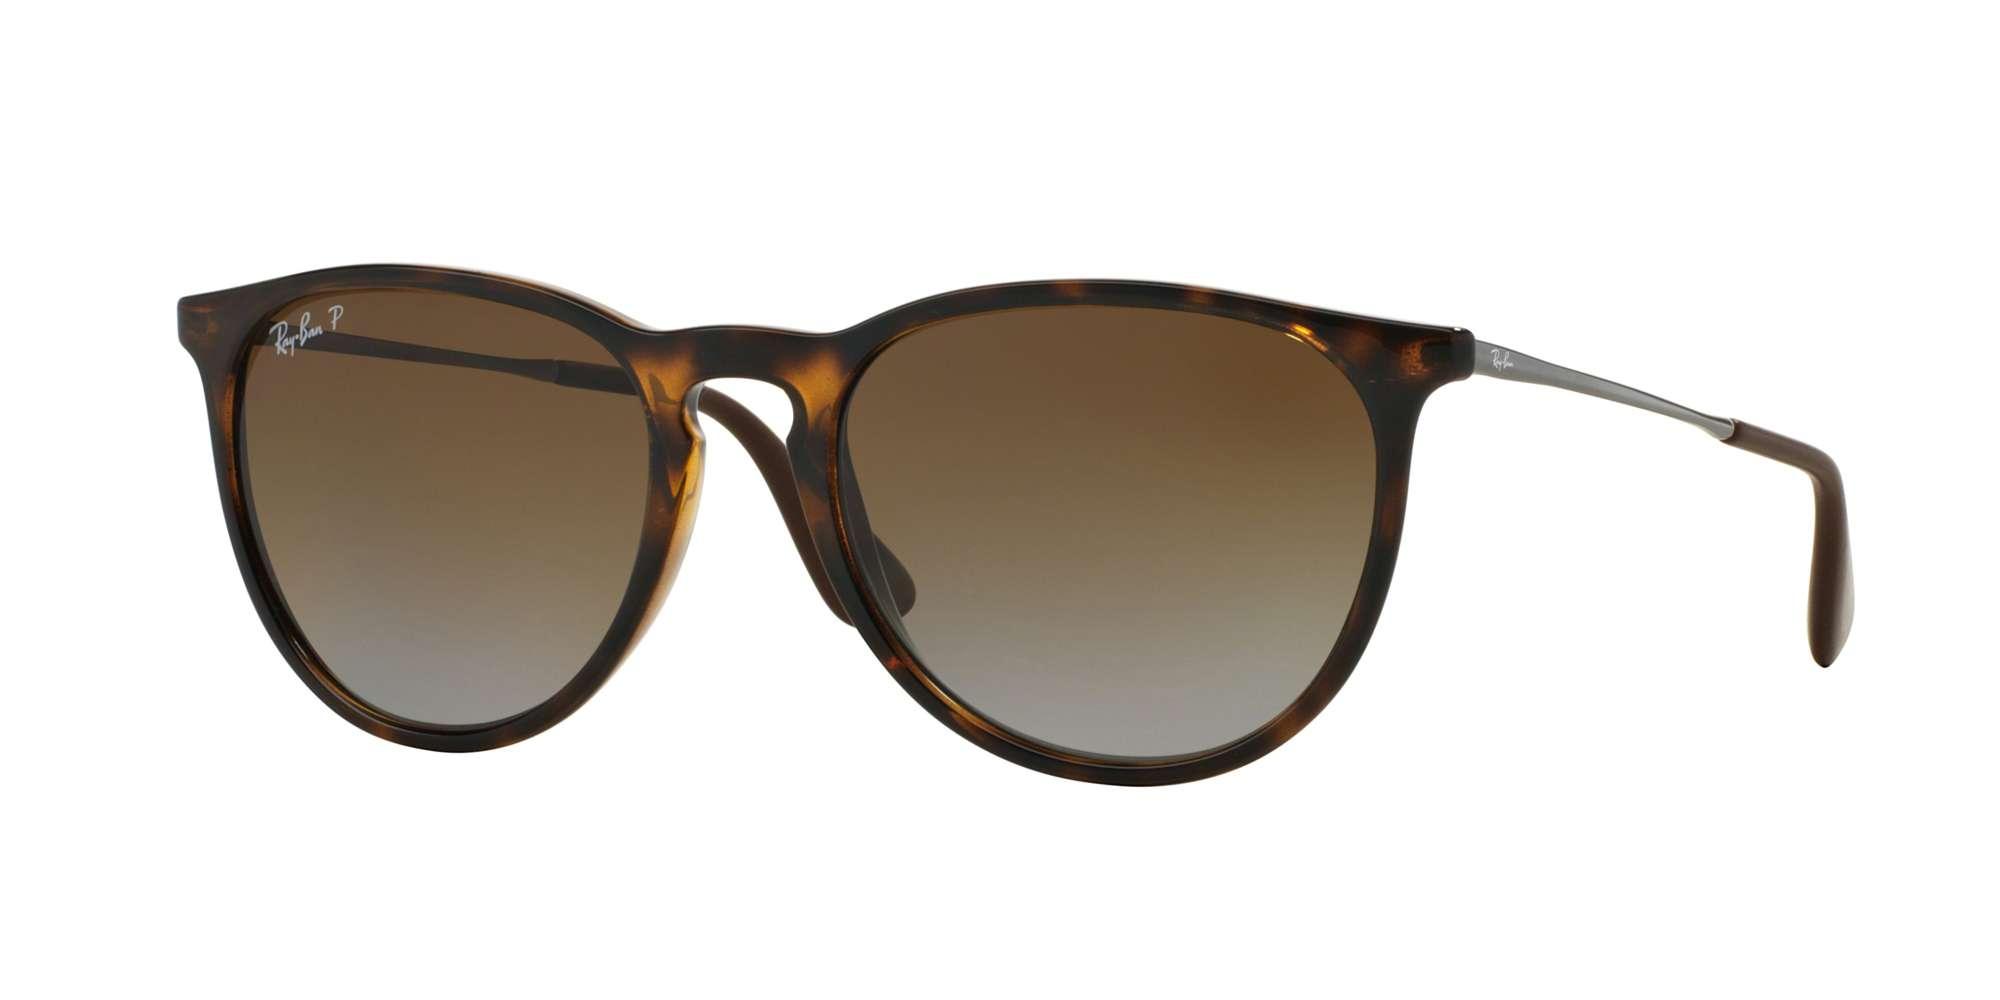 HAVANA / POLAR BROWN GARDIENT lenses